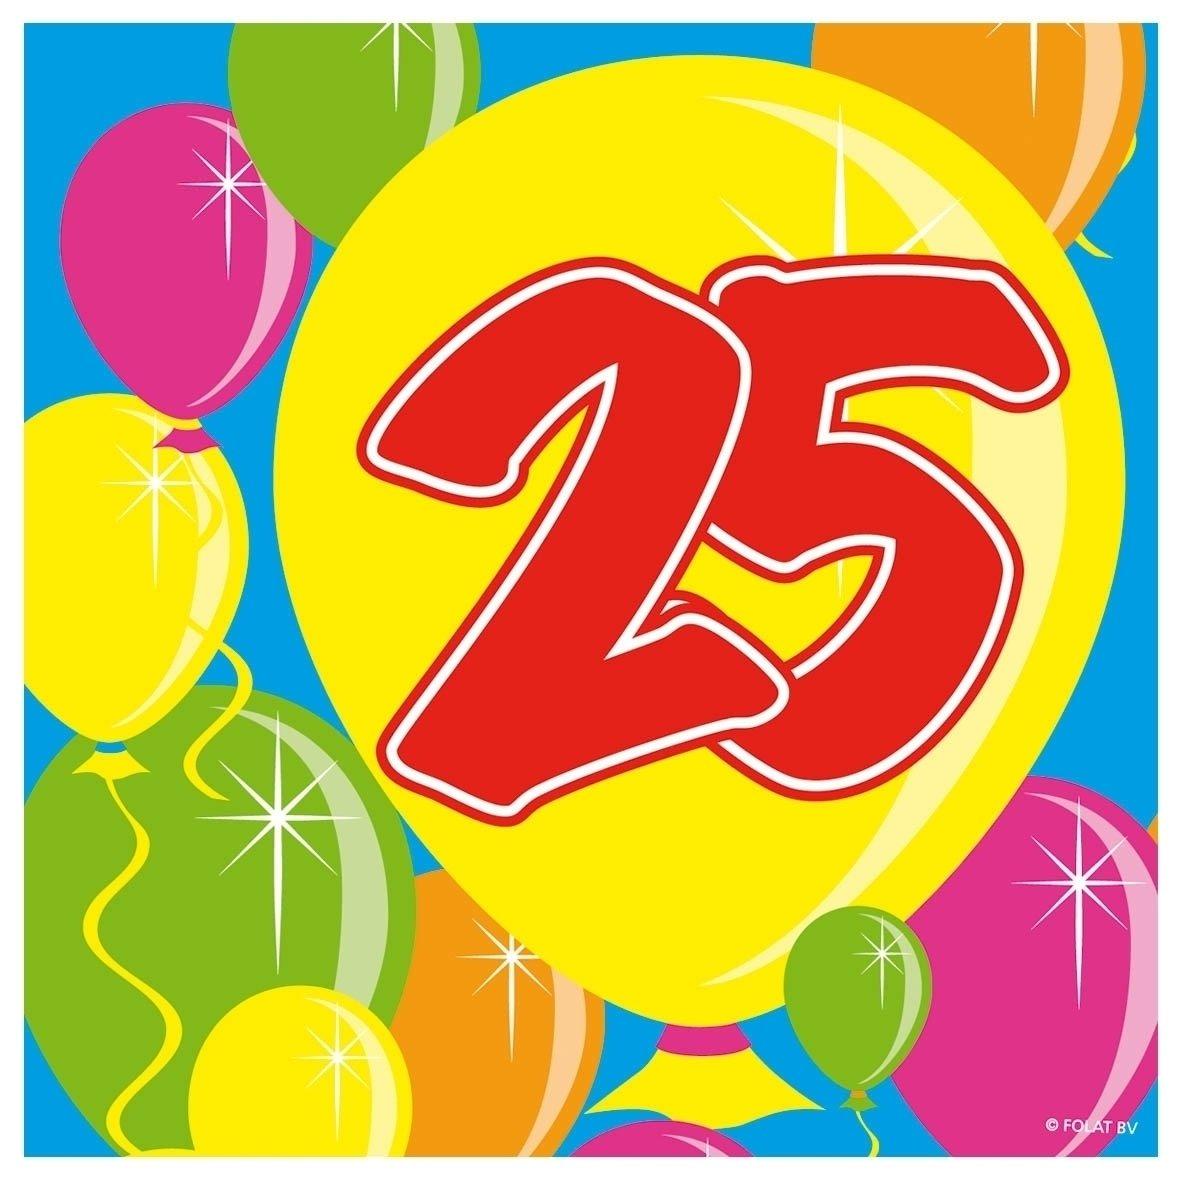 20 Tovaglioli 25 ° Anniversario Folat B.V.